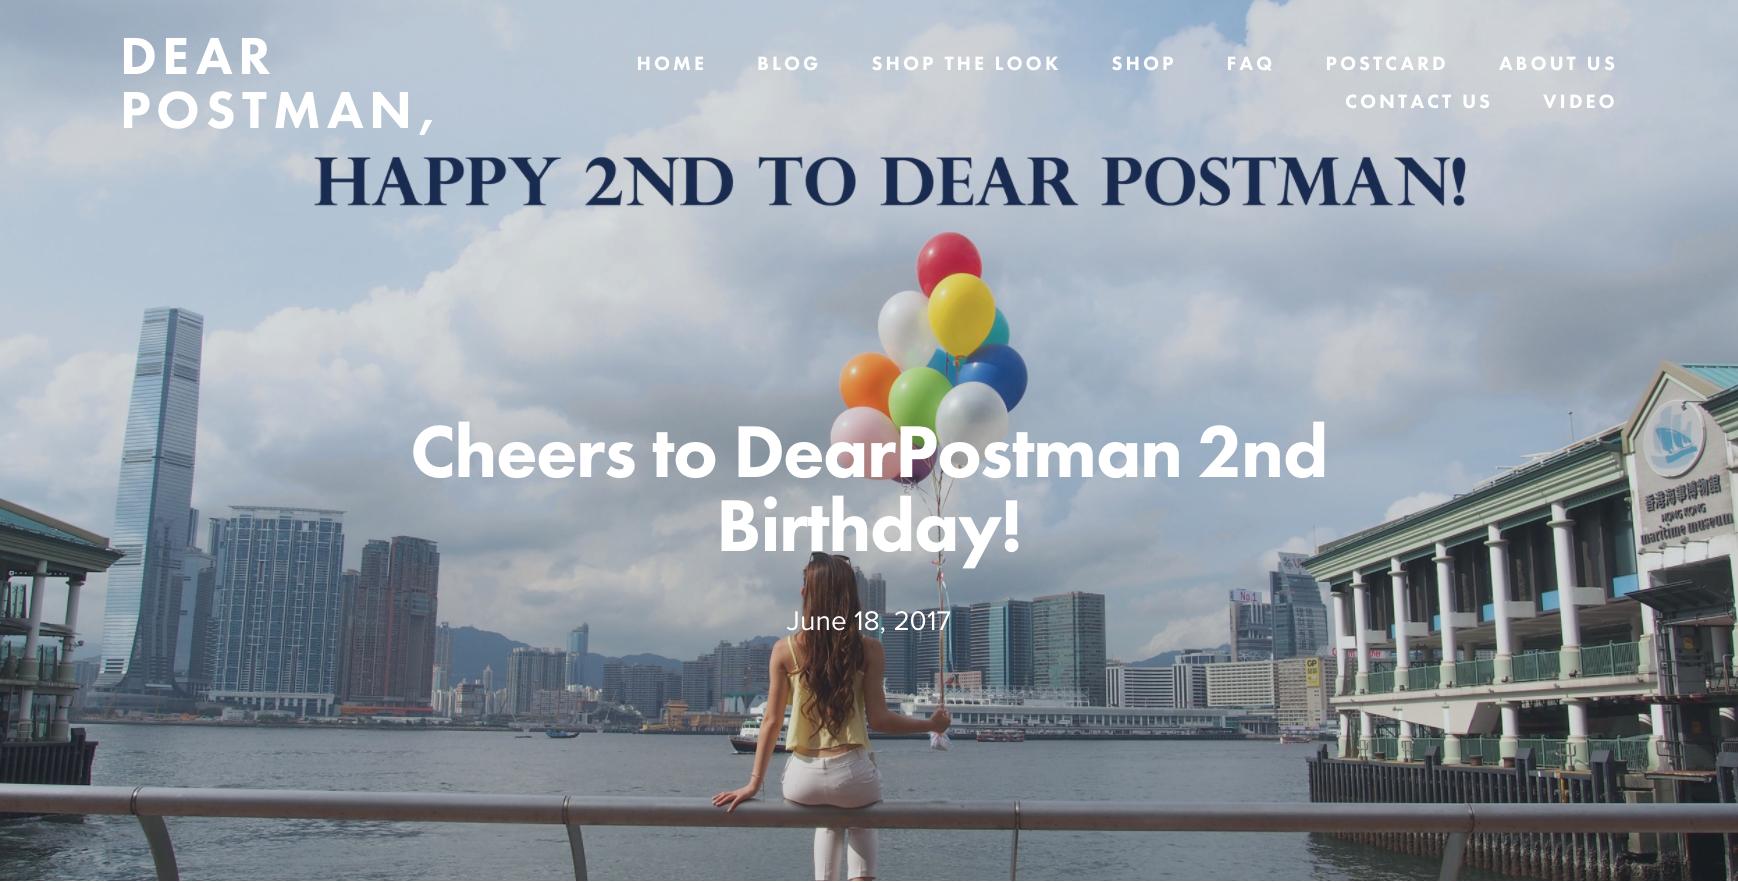 Cheers to DearPostman 2nd Birthday!